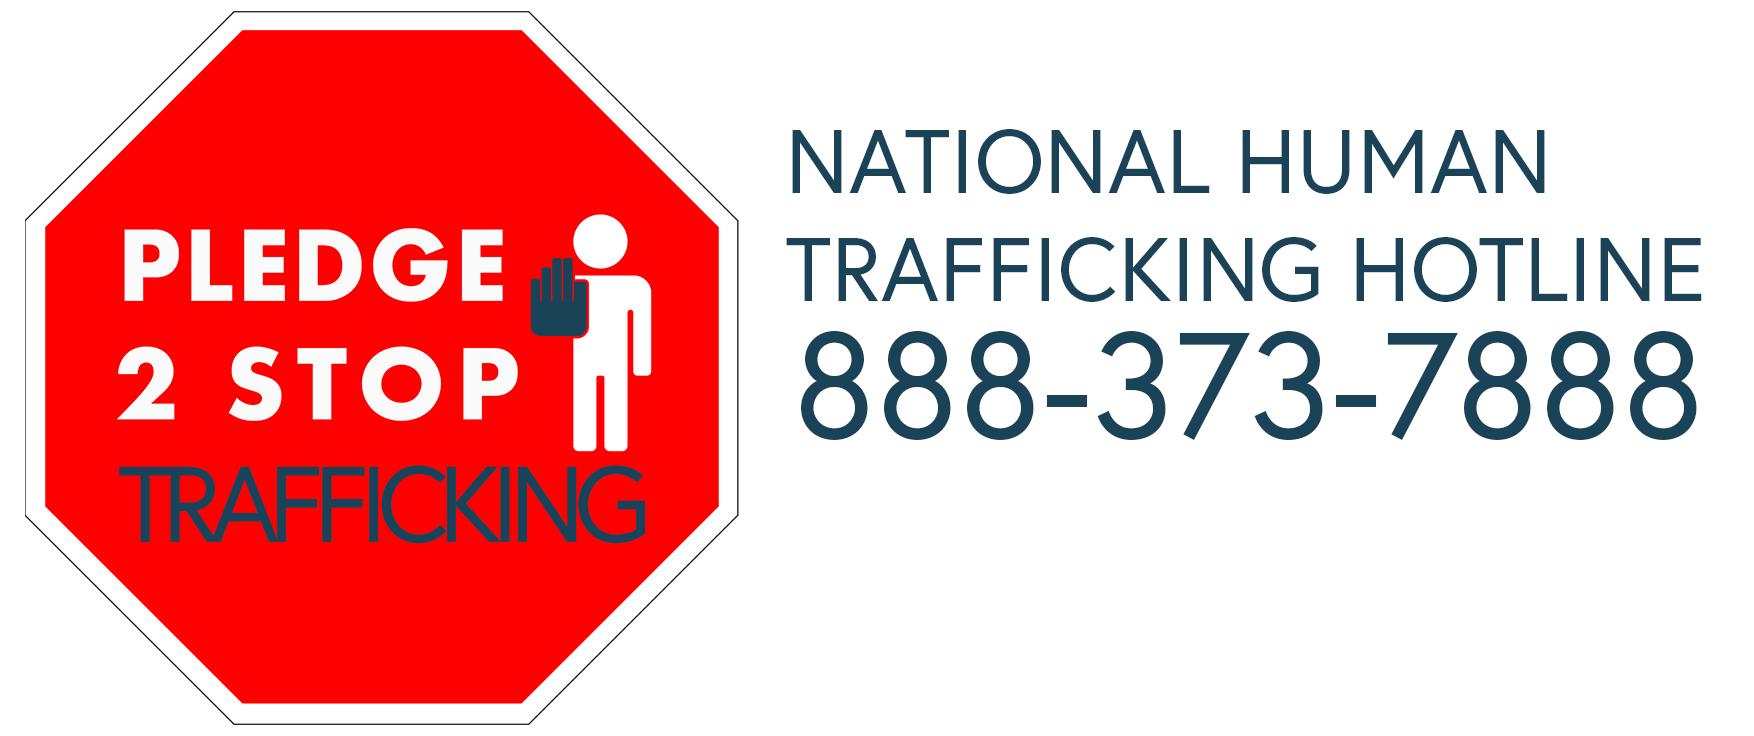 Pledge 2 Stop Trafficking